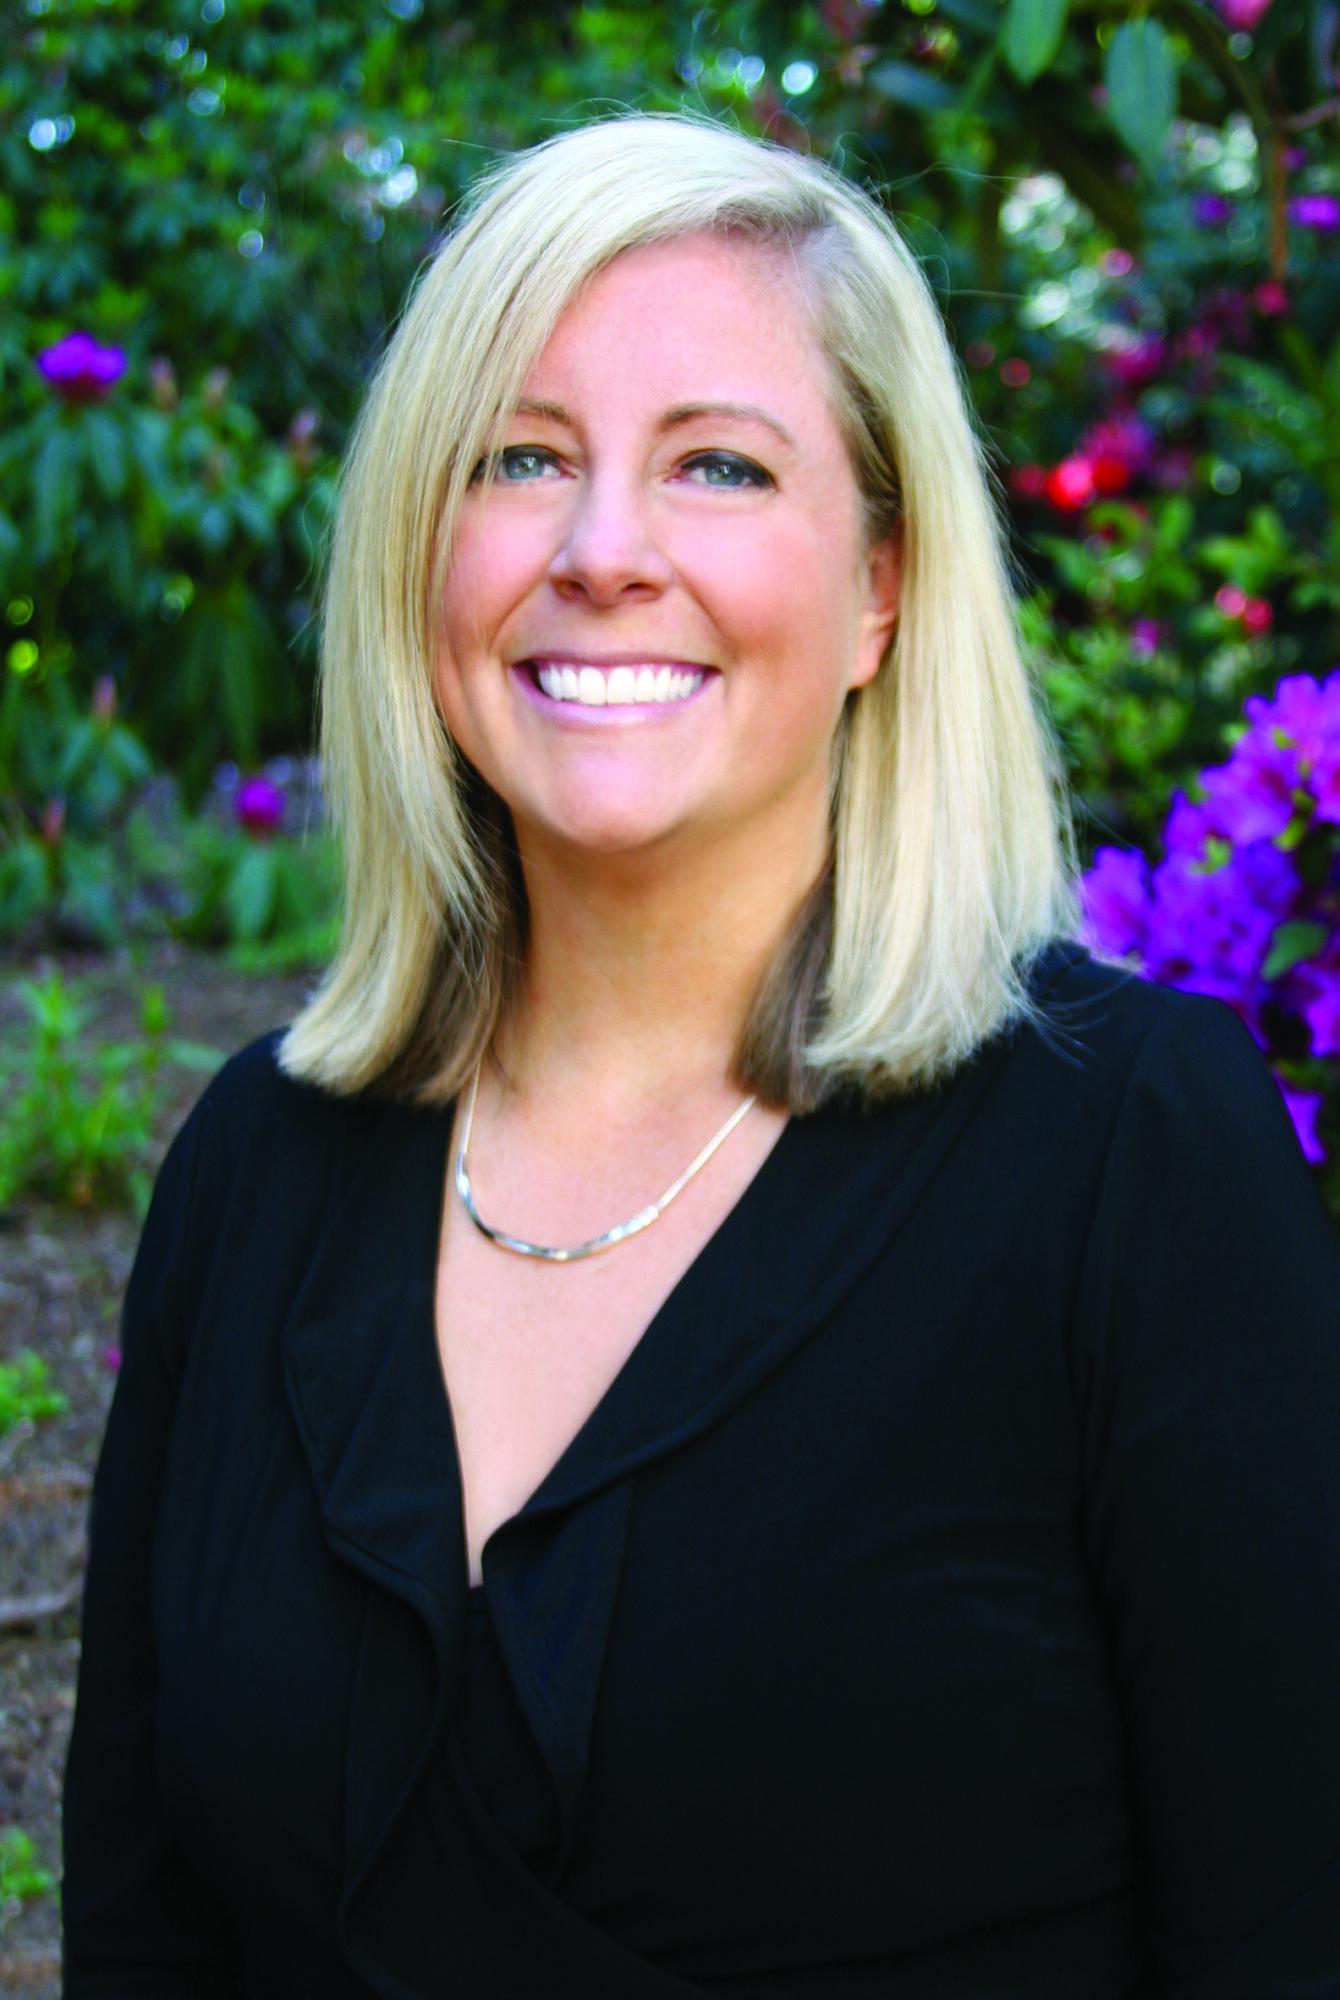 Stephanie Michael 32 Pearls Tacoma Dentistry